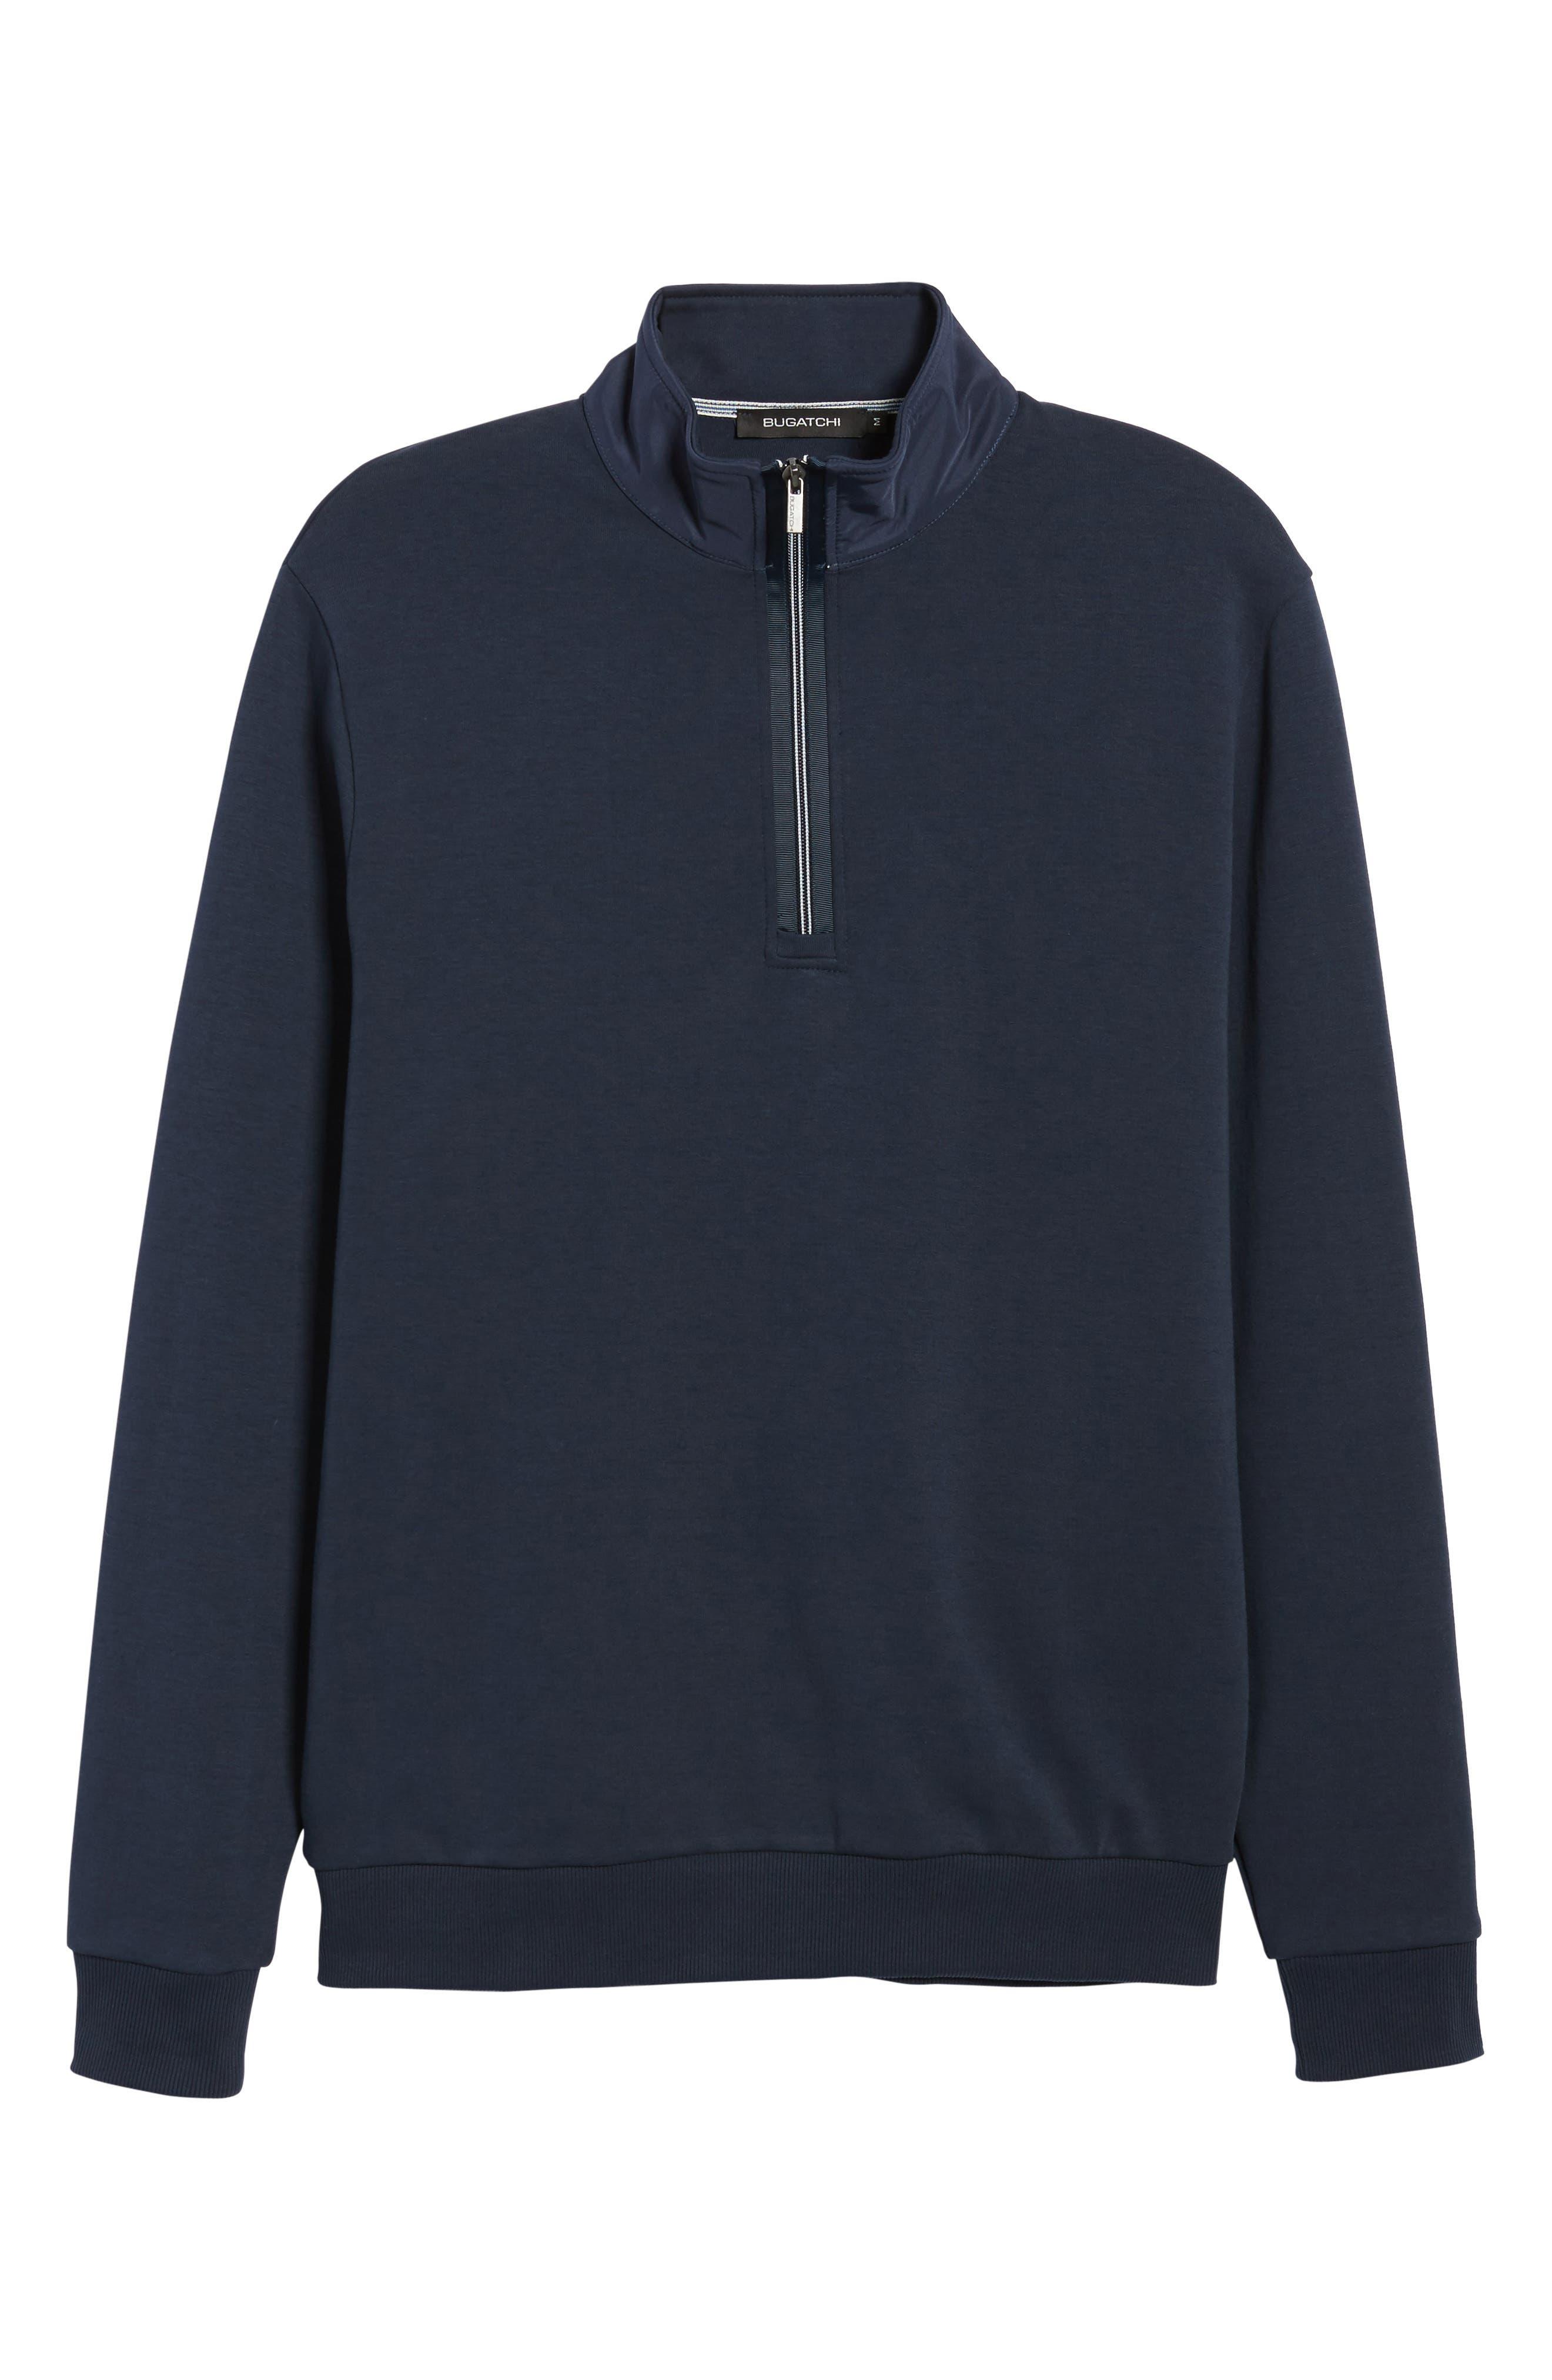 Regular Fit Quarter Zip Pullover,                             Alternate thumbnail 6, color,                             Navy